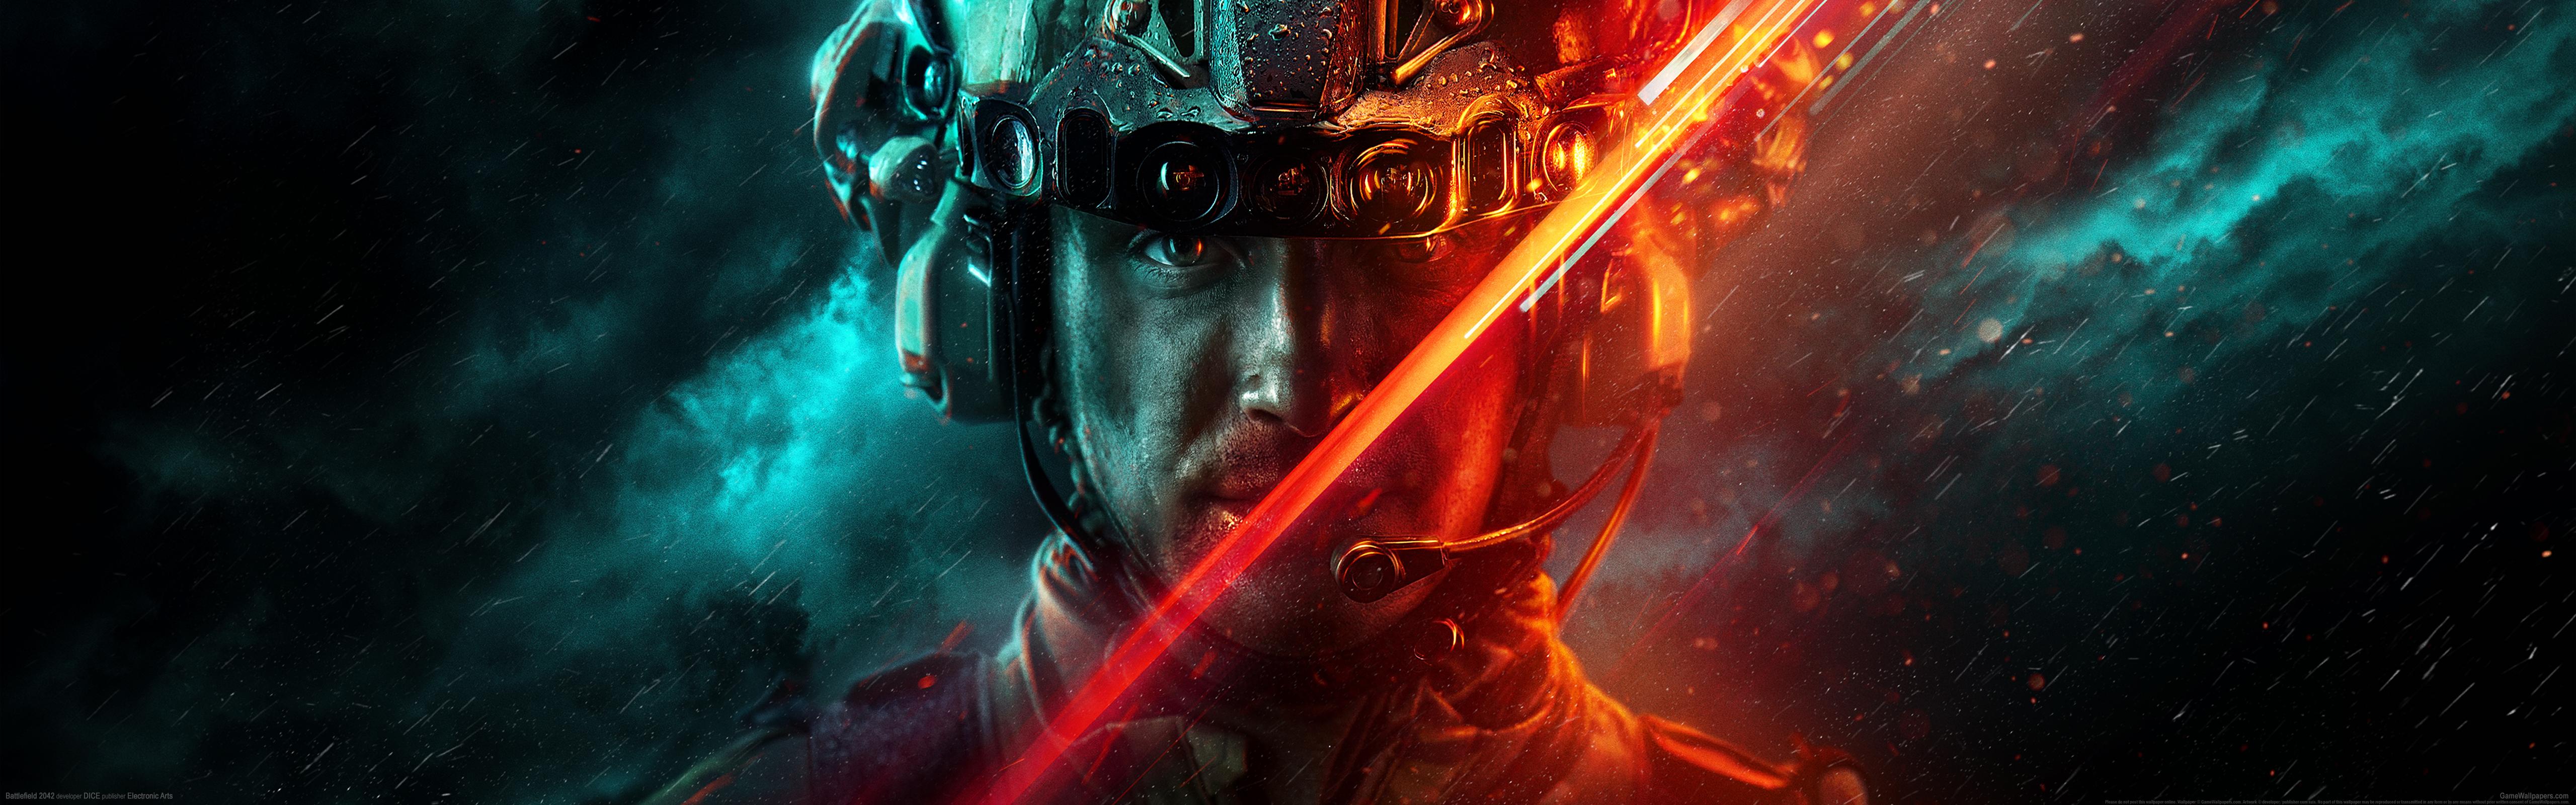 Battlefield 2042 EA Games Video Games Multiple Display 5120x1600